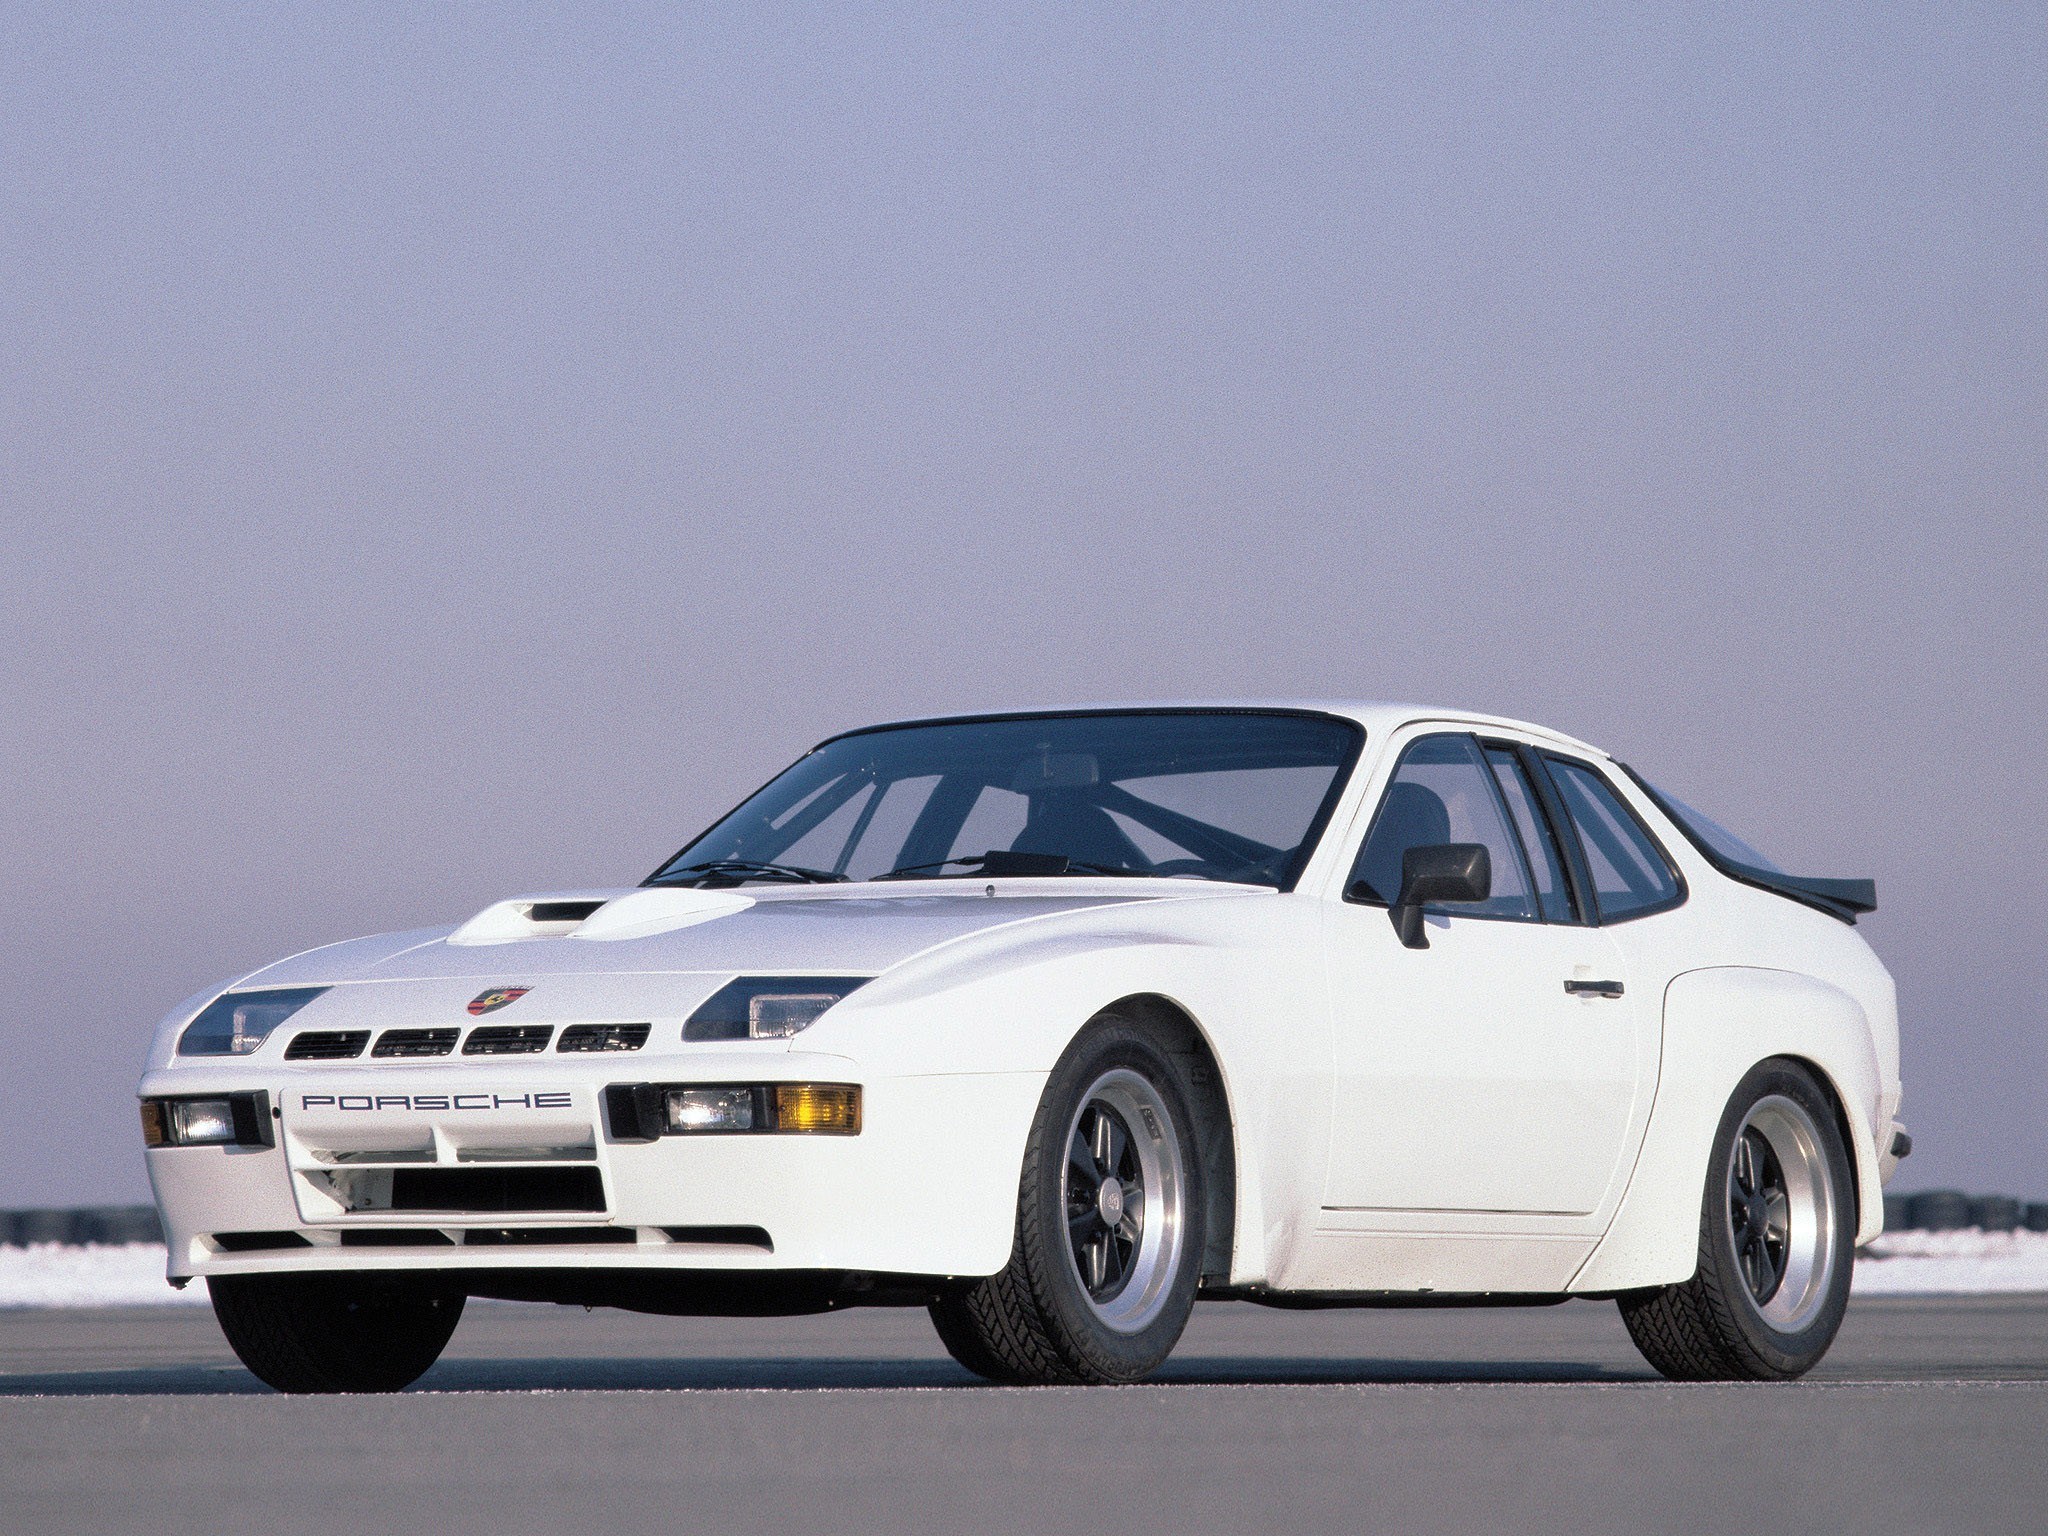 Porsche 924 Carrera GTS 937 1981